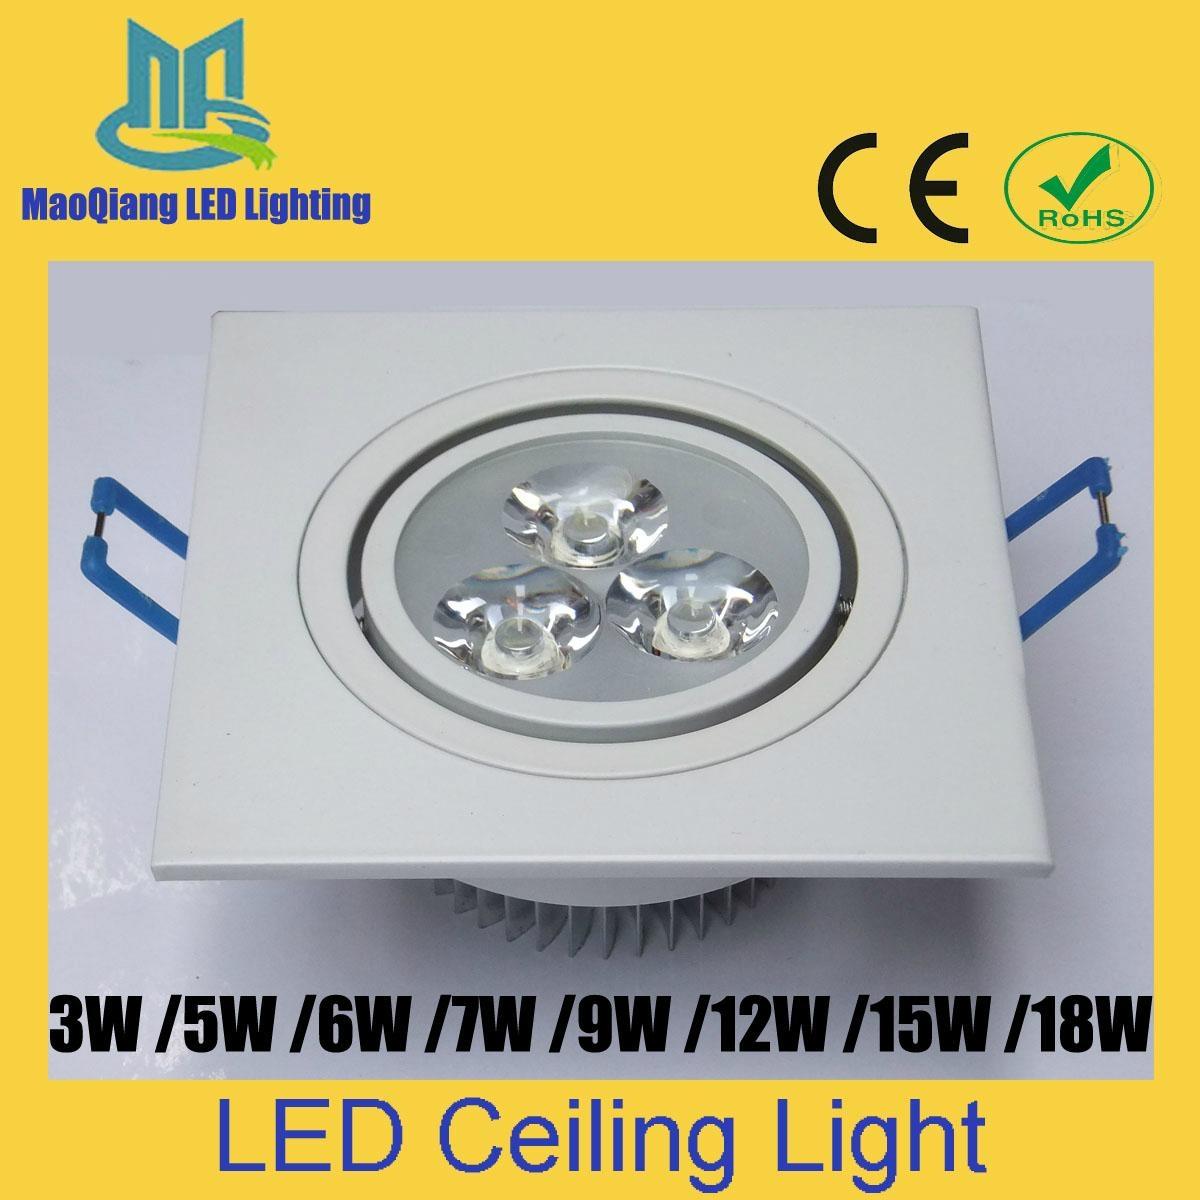 LED Ceiling Down Light Indoor Spot Lamp for Home Living Room Decoration Light 1